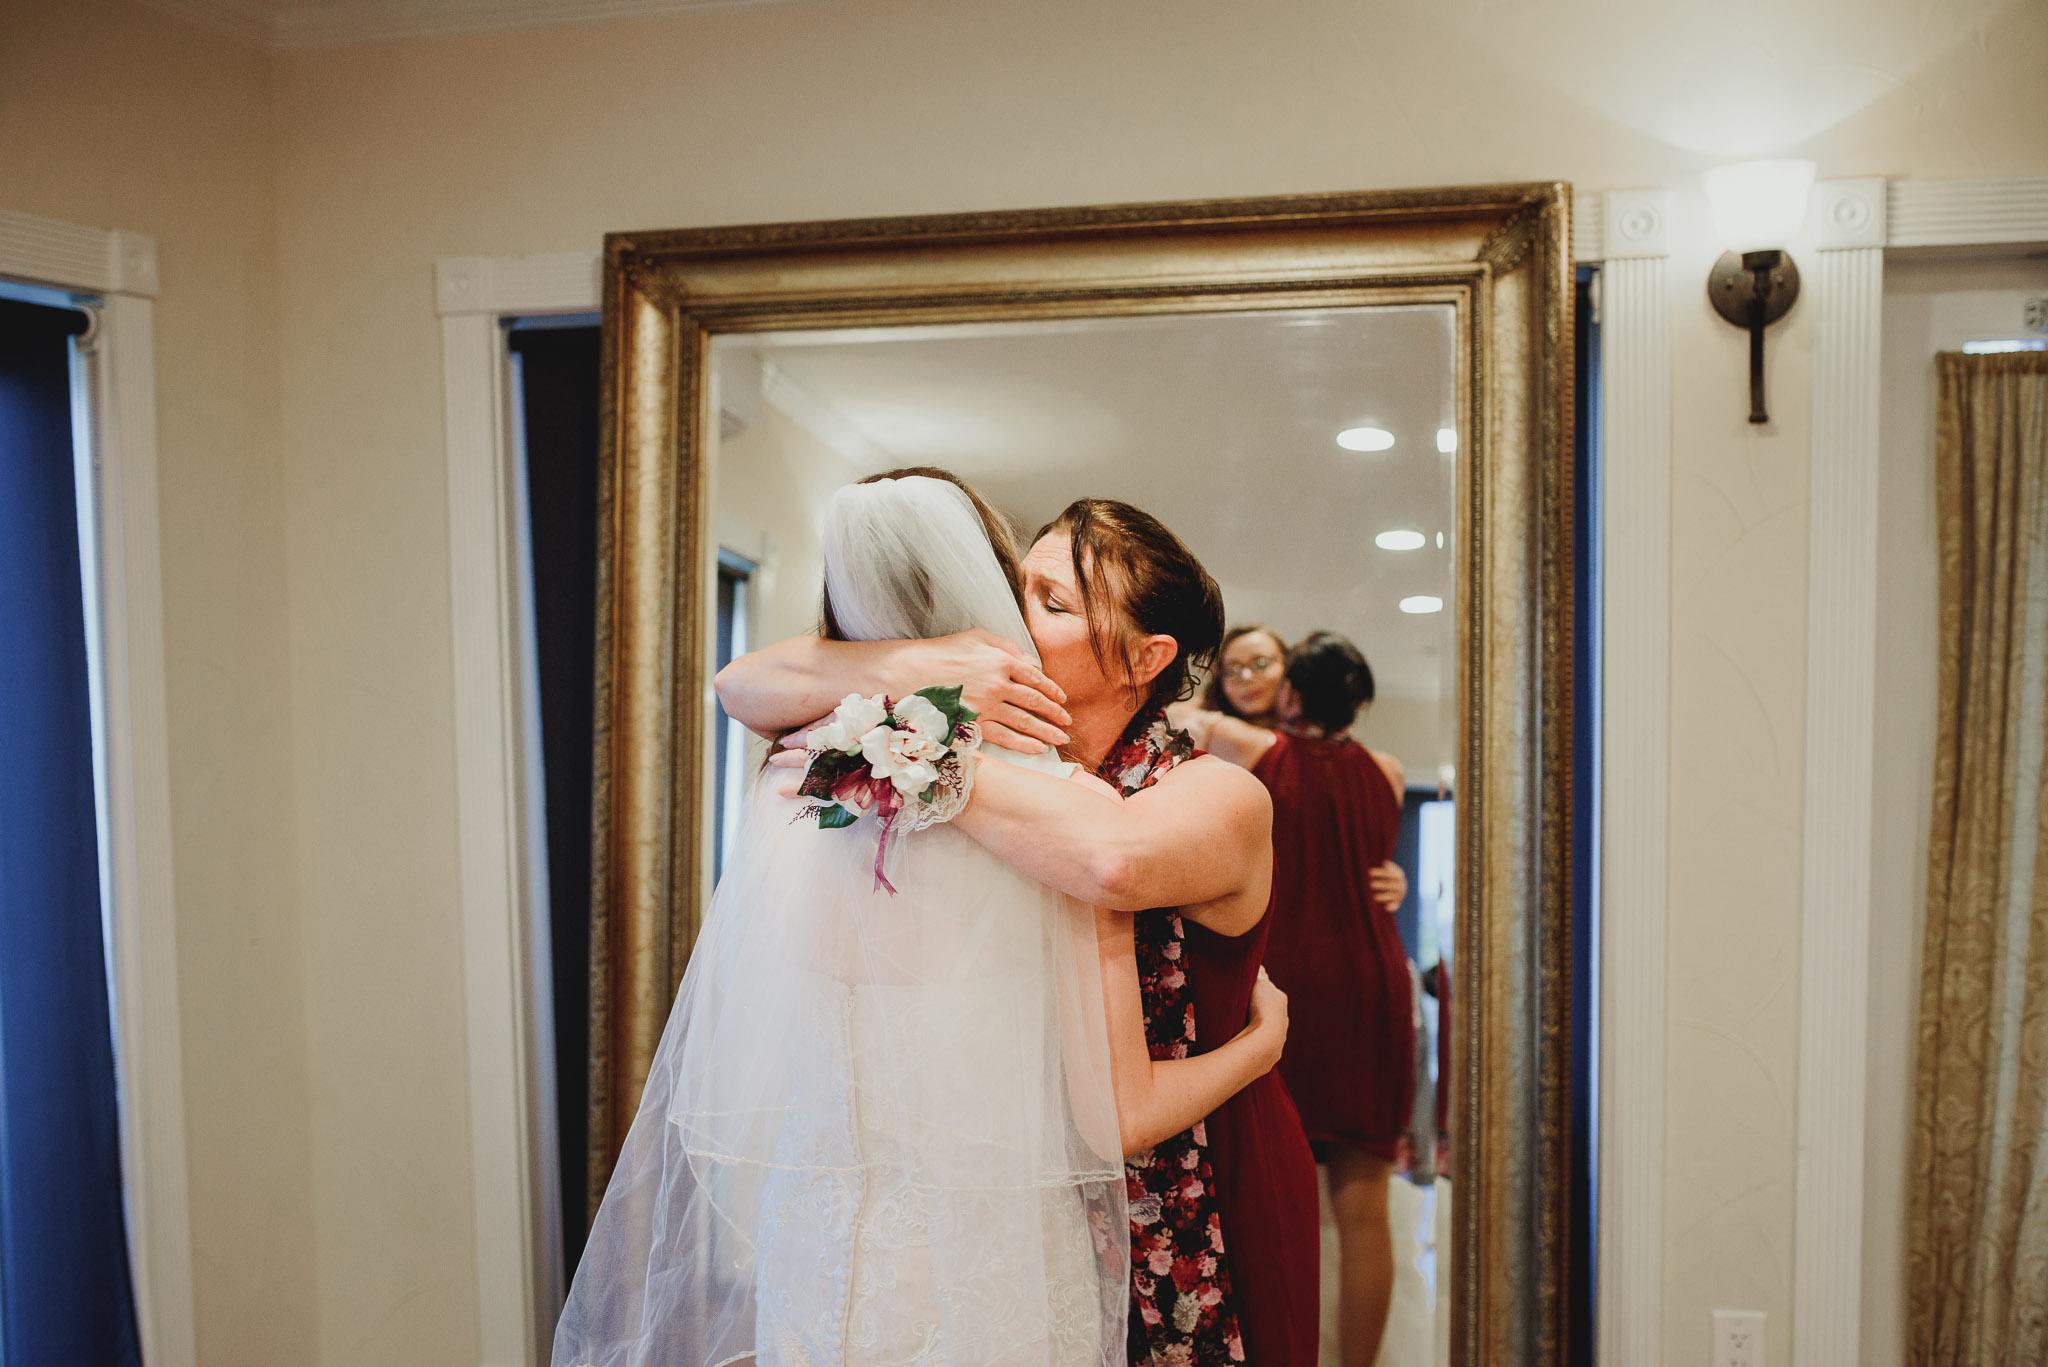 Austin-Texas-Wedding-Vintage-Villas-0003-2.jpg